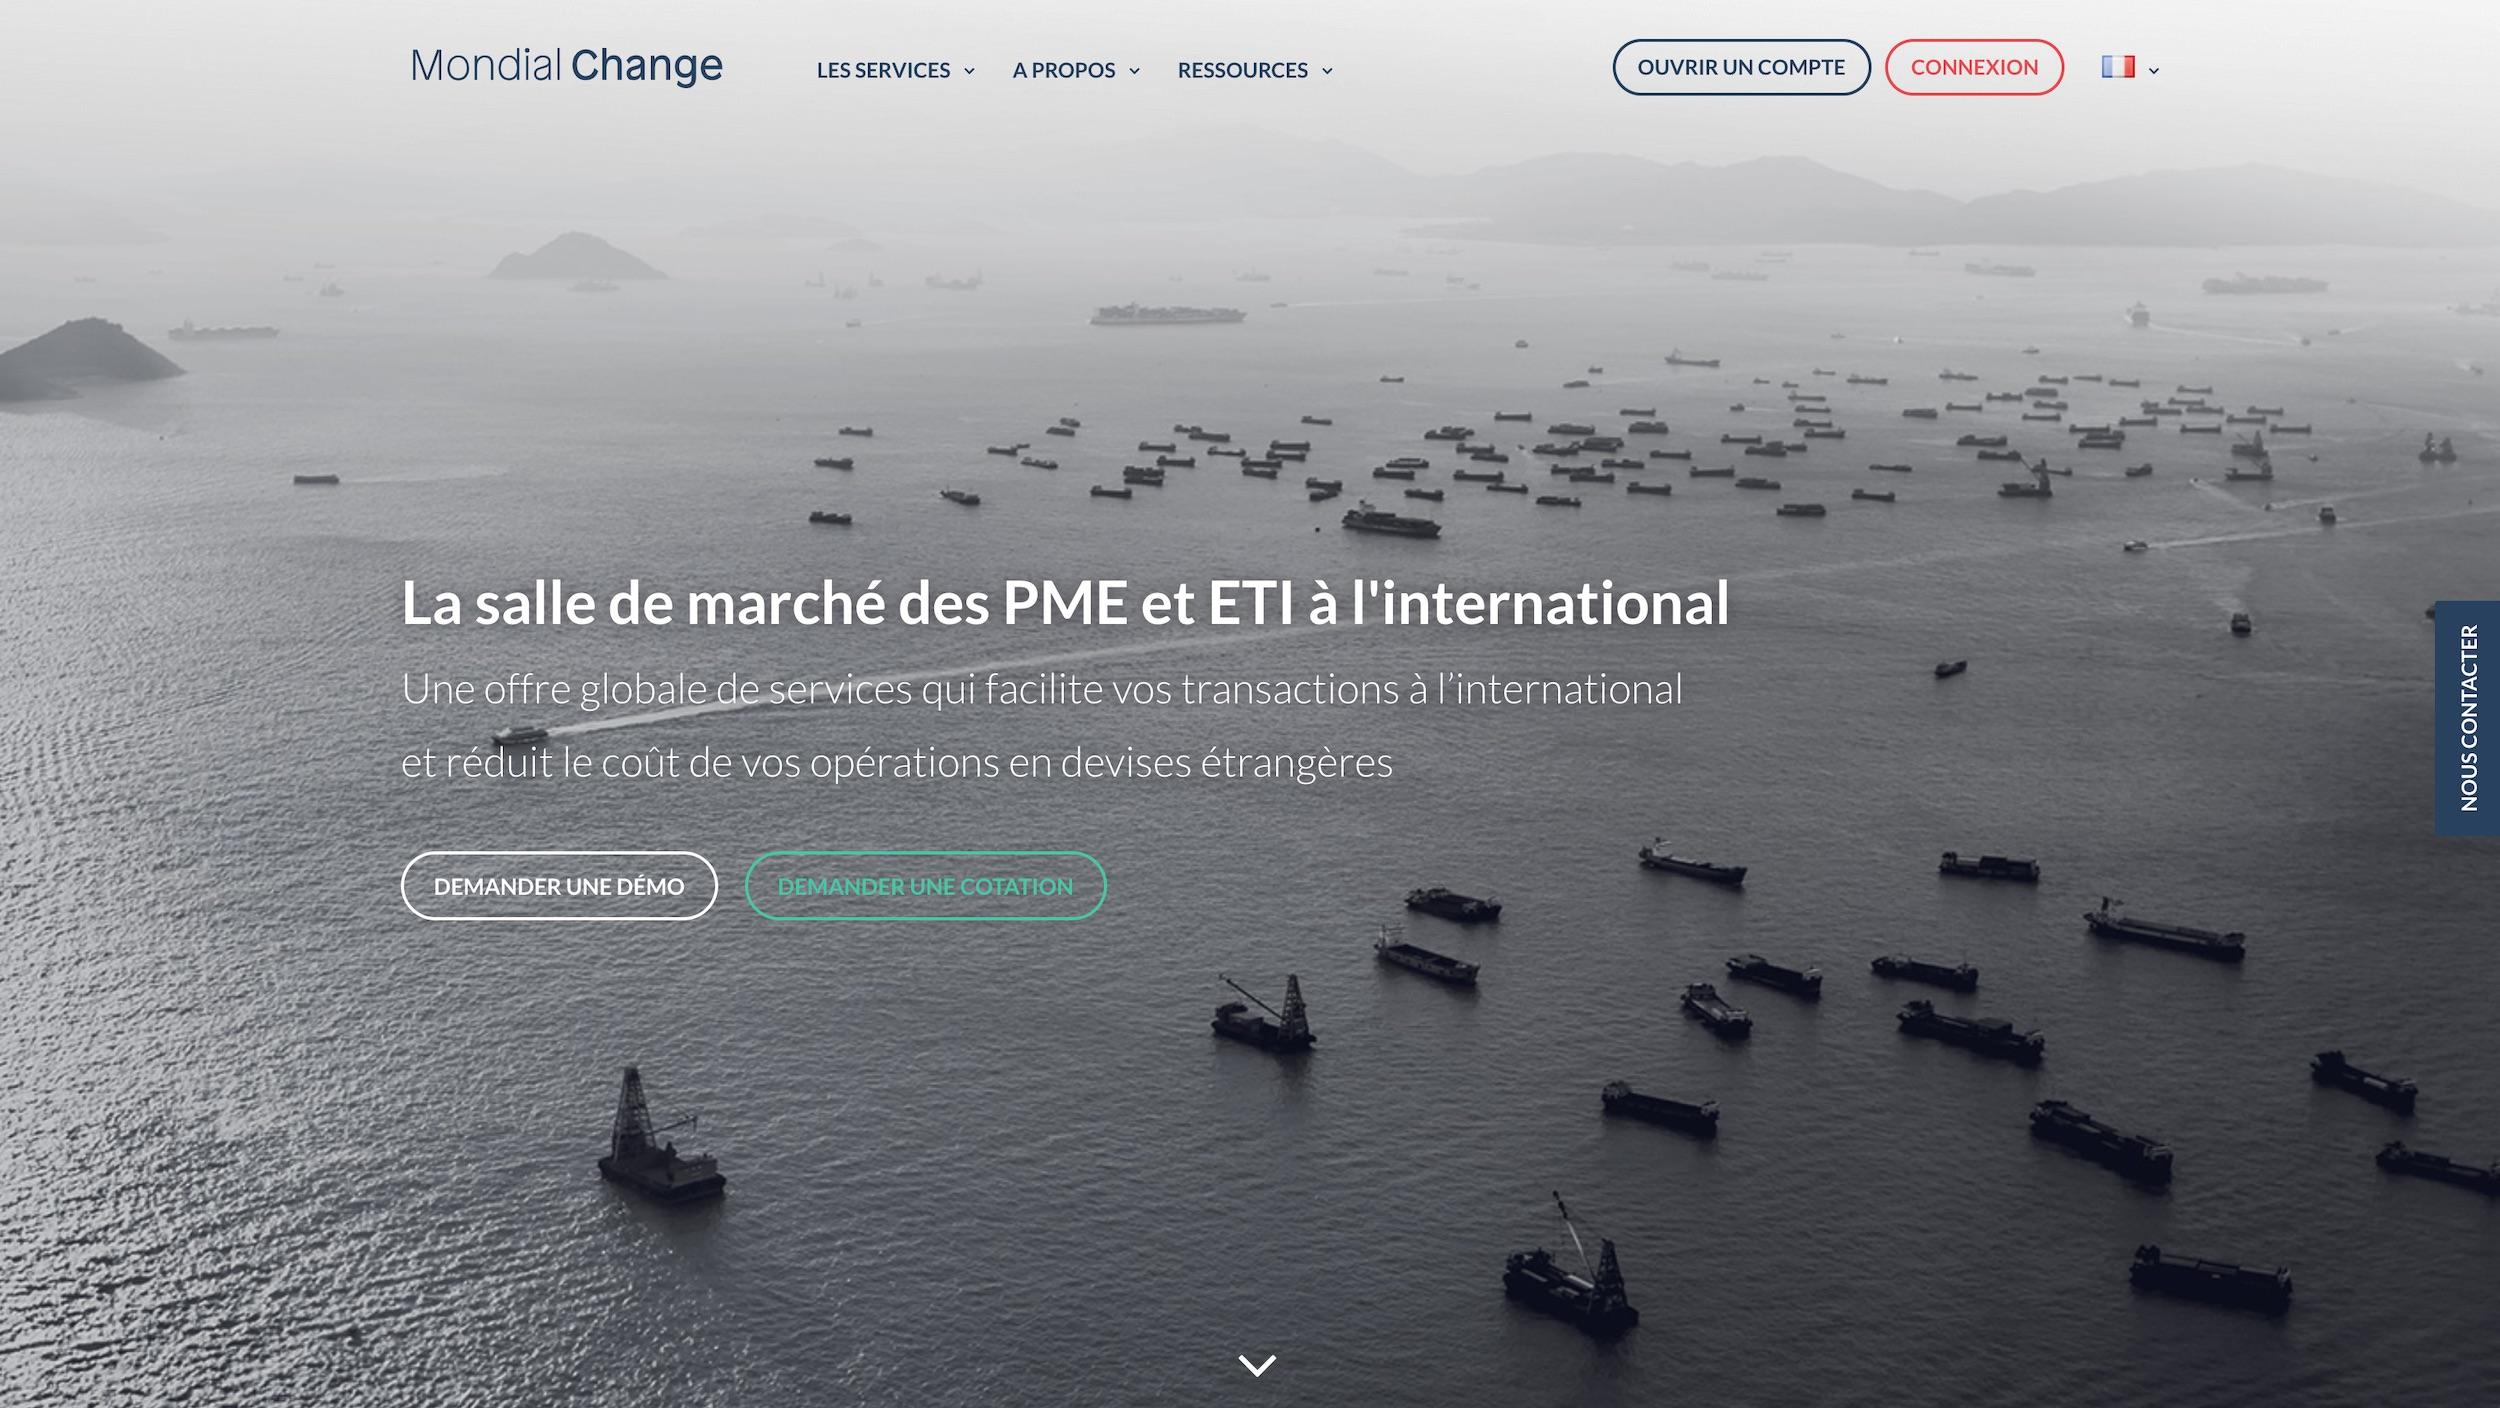 mondial-change-website-screenshot